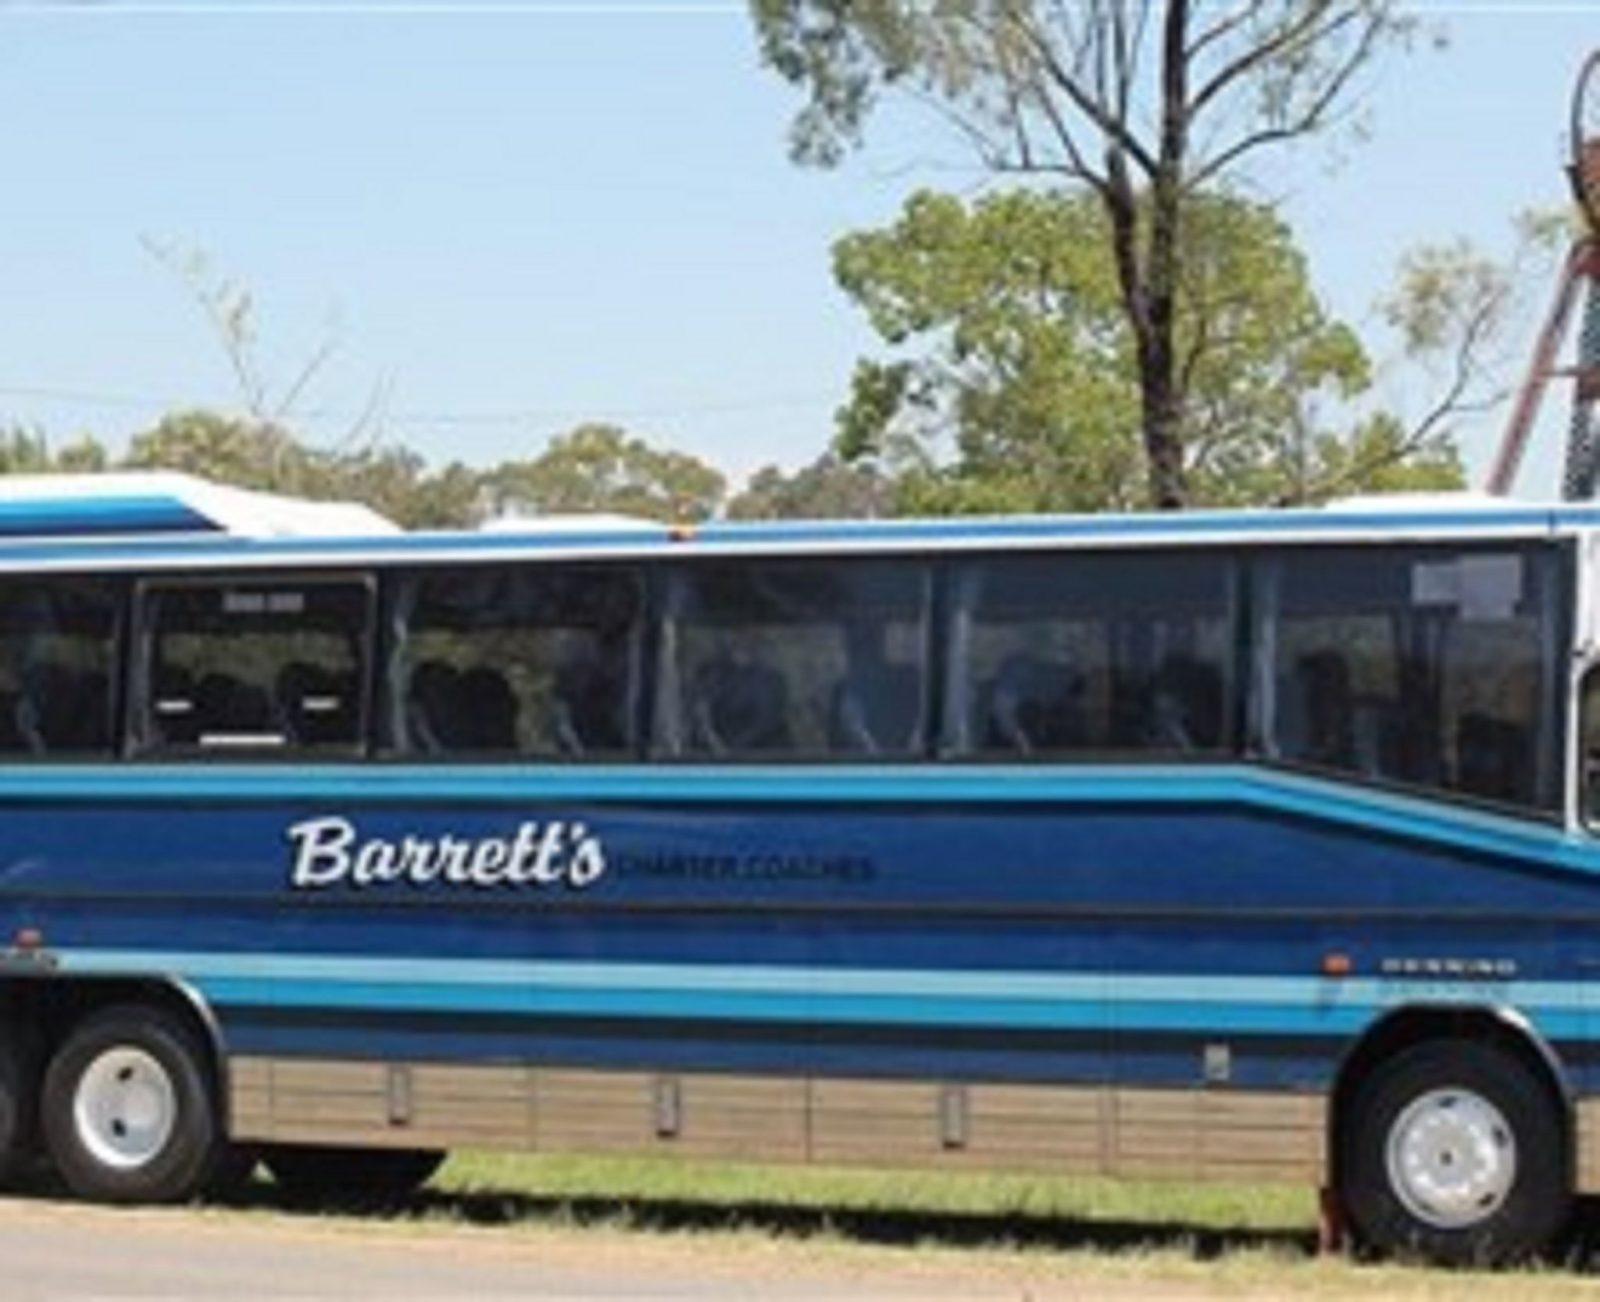 Barretts Charter Coaches